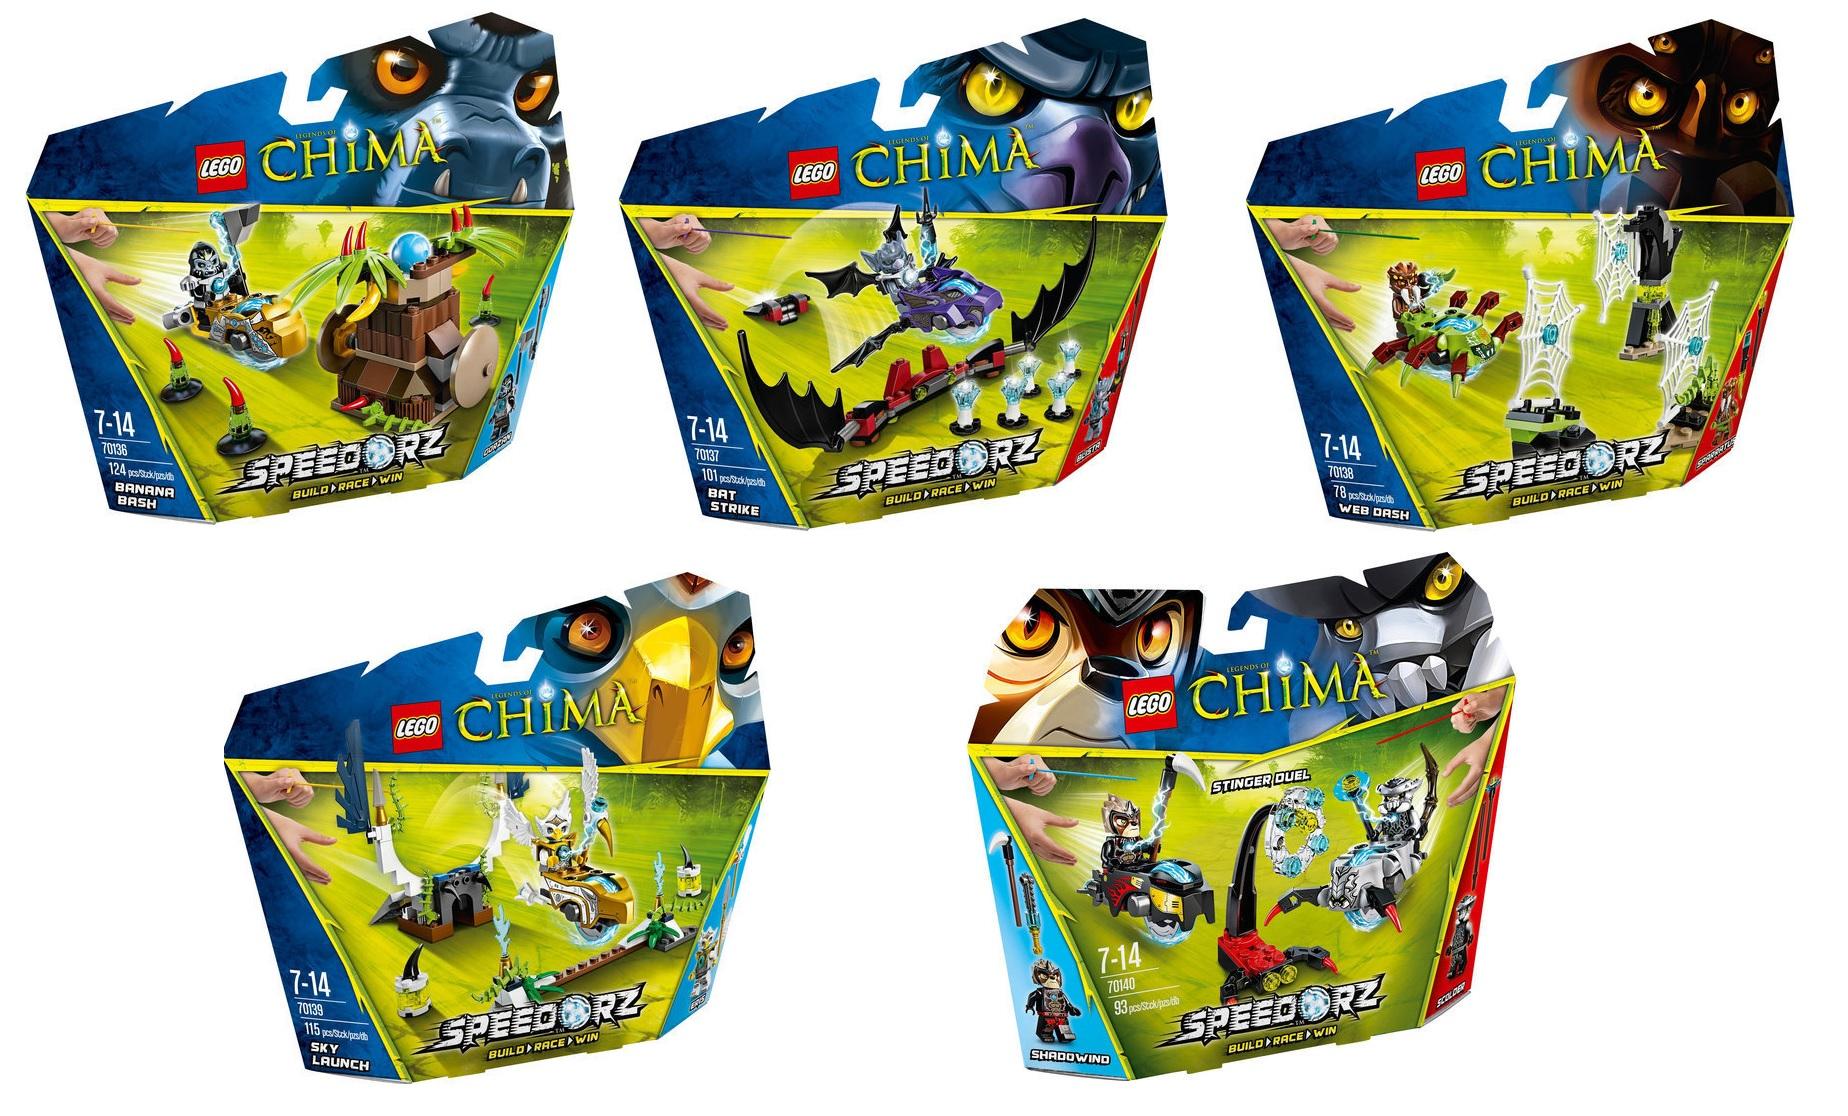 LEGENDS OF CHIMA! - Página 2 2014-LEGO-Chima-Speedorz-70136-70137-70138-70139-70140